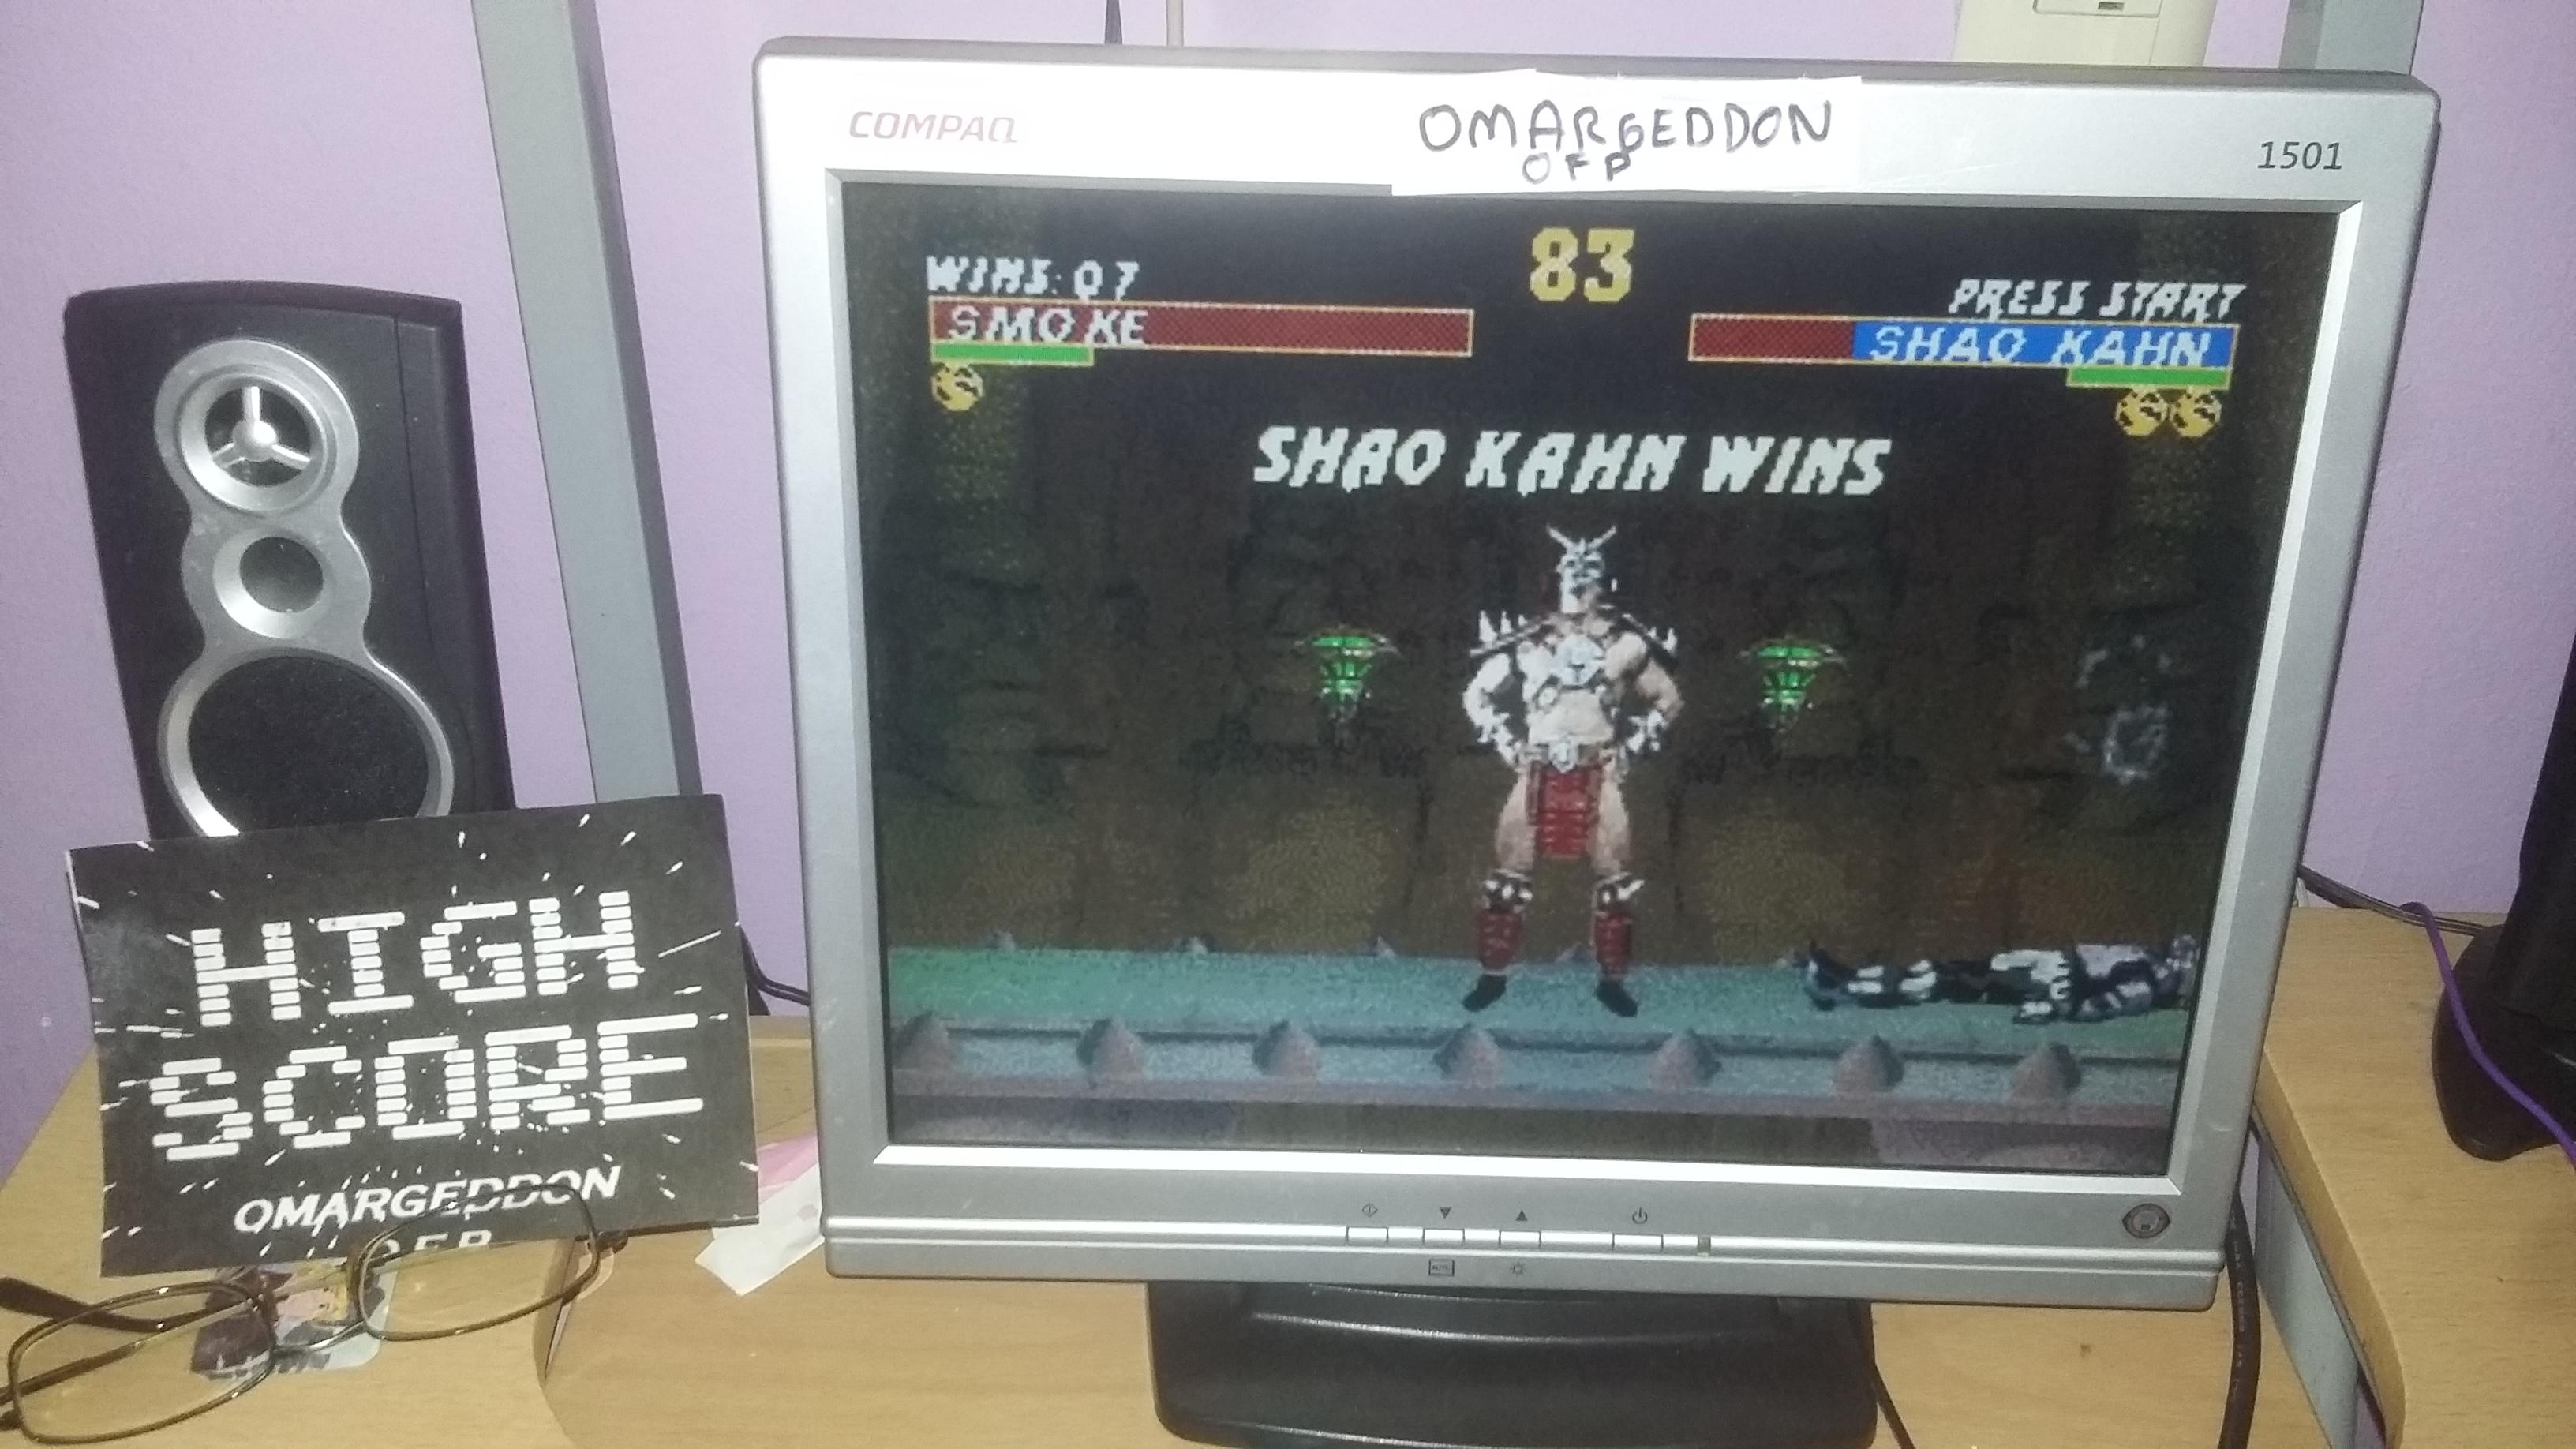 omargeddon: Ultimate Mortal Kombat 3 [Win Streak] (Sega Genesis / MegaDrive Emulated) 7 points on 2016-10-26 20:30:23